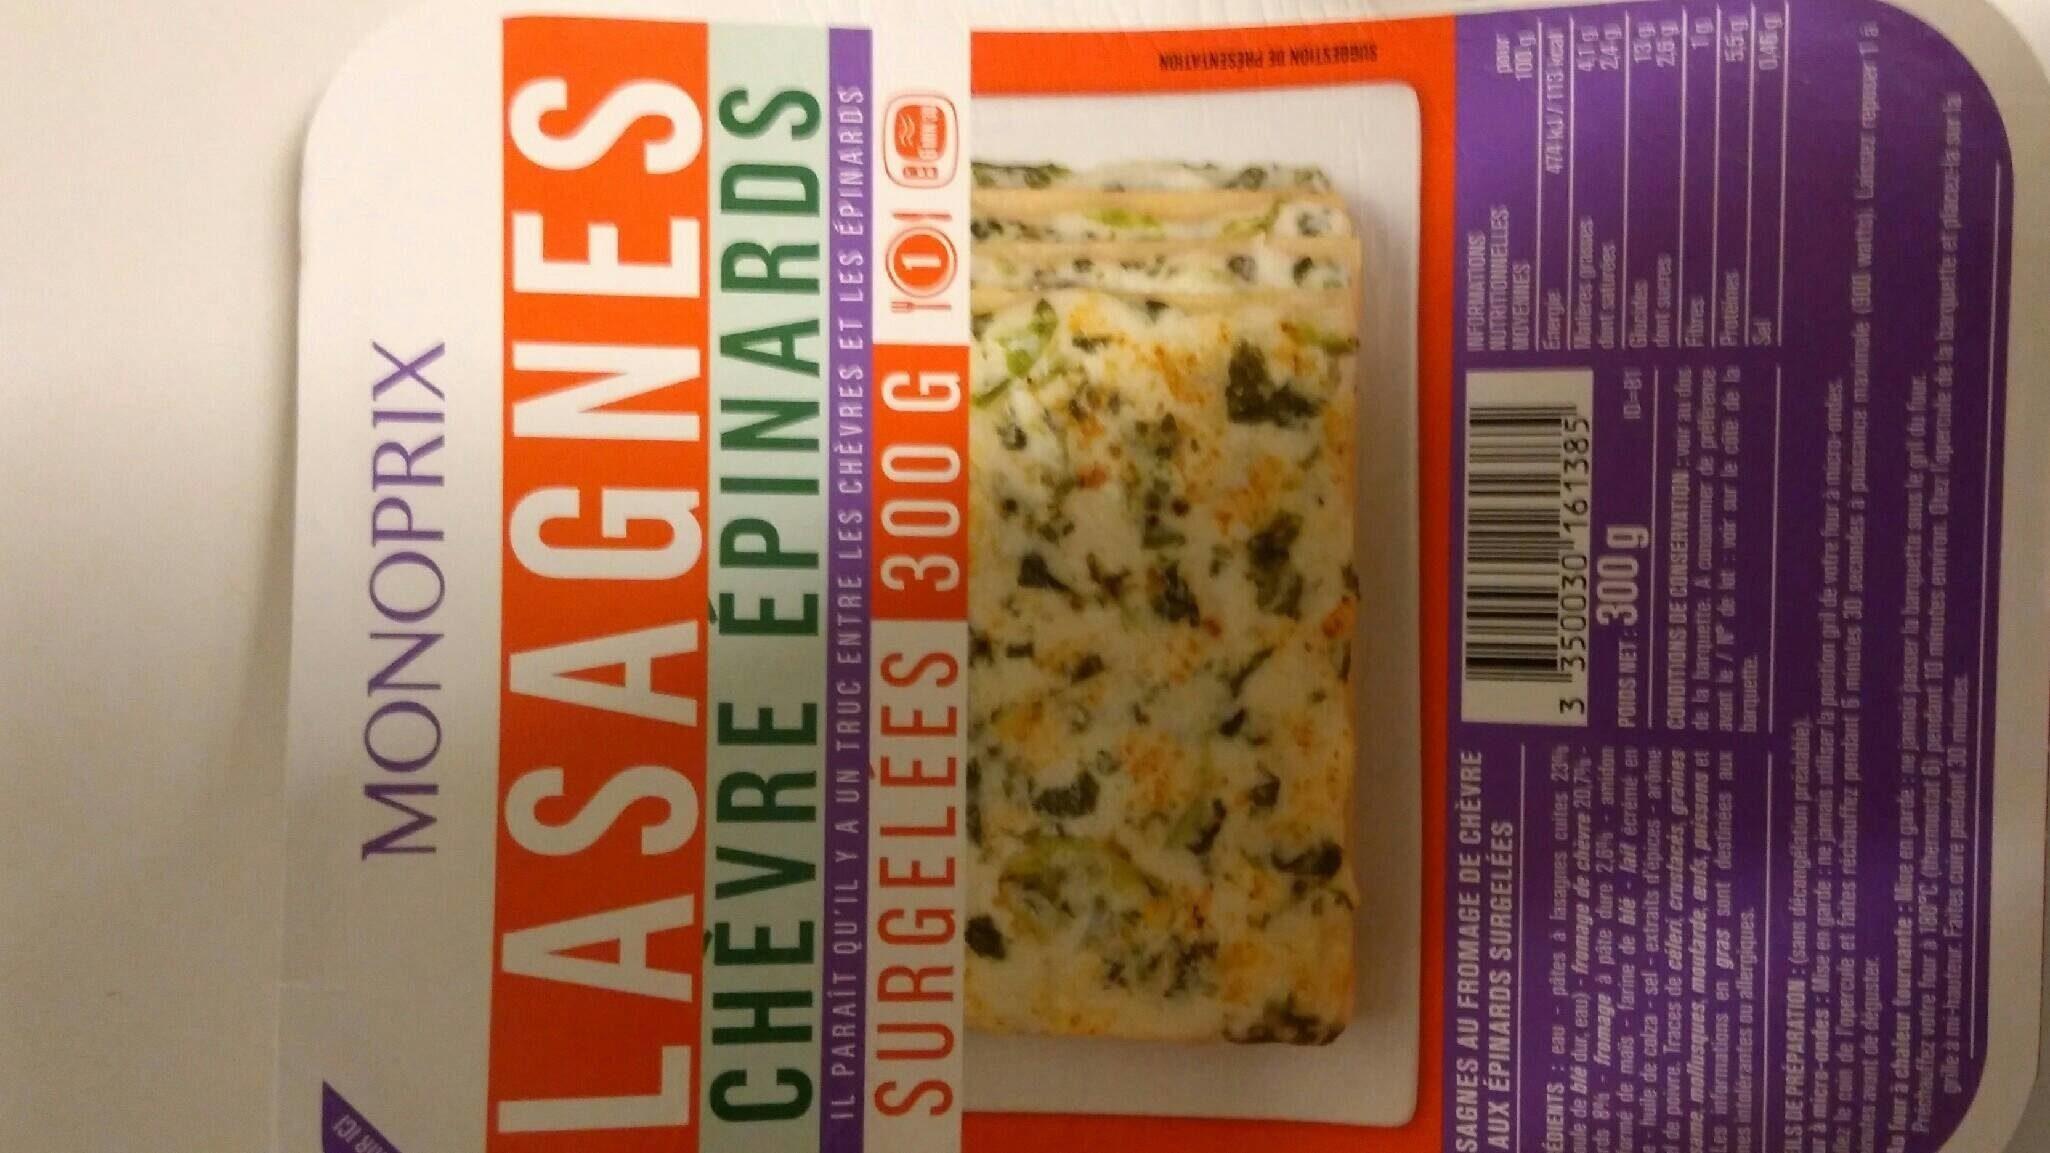 Lasagnes chèvre épinards - Nährwertangaben - fr